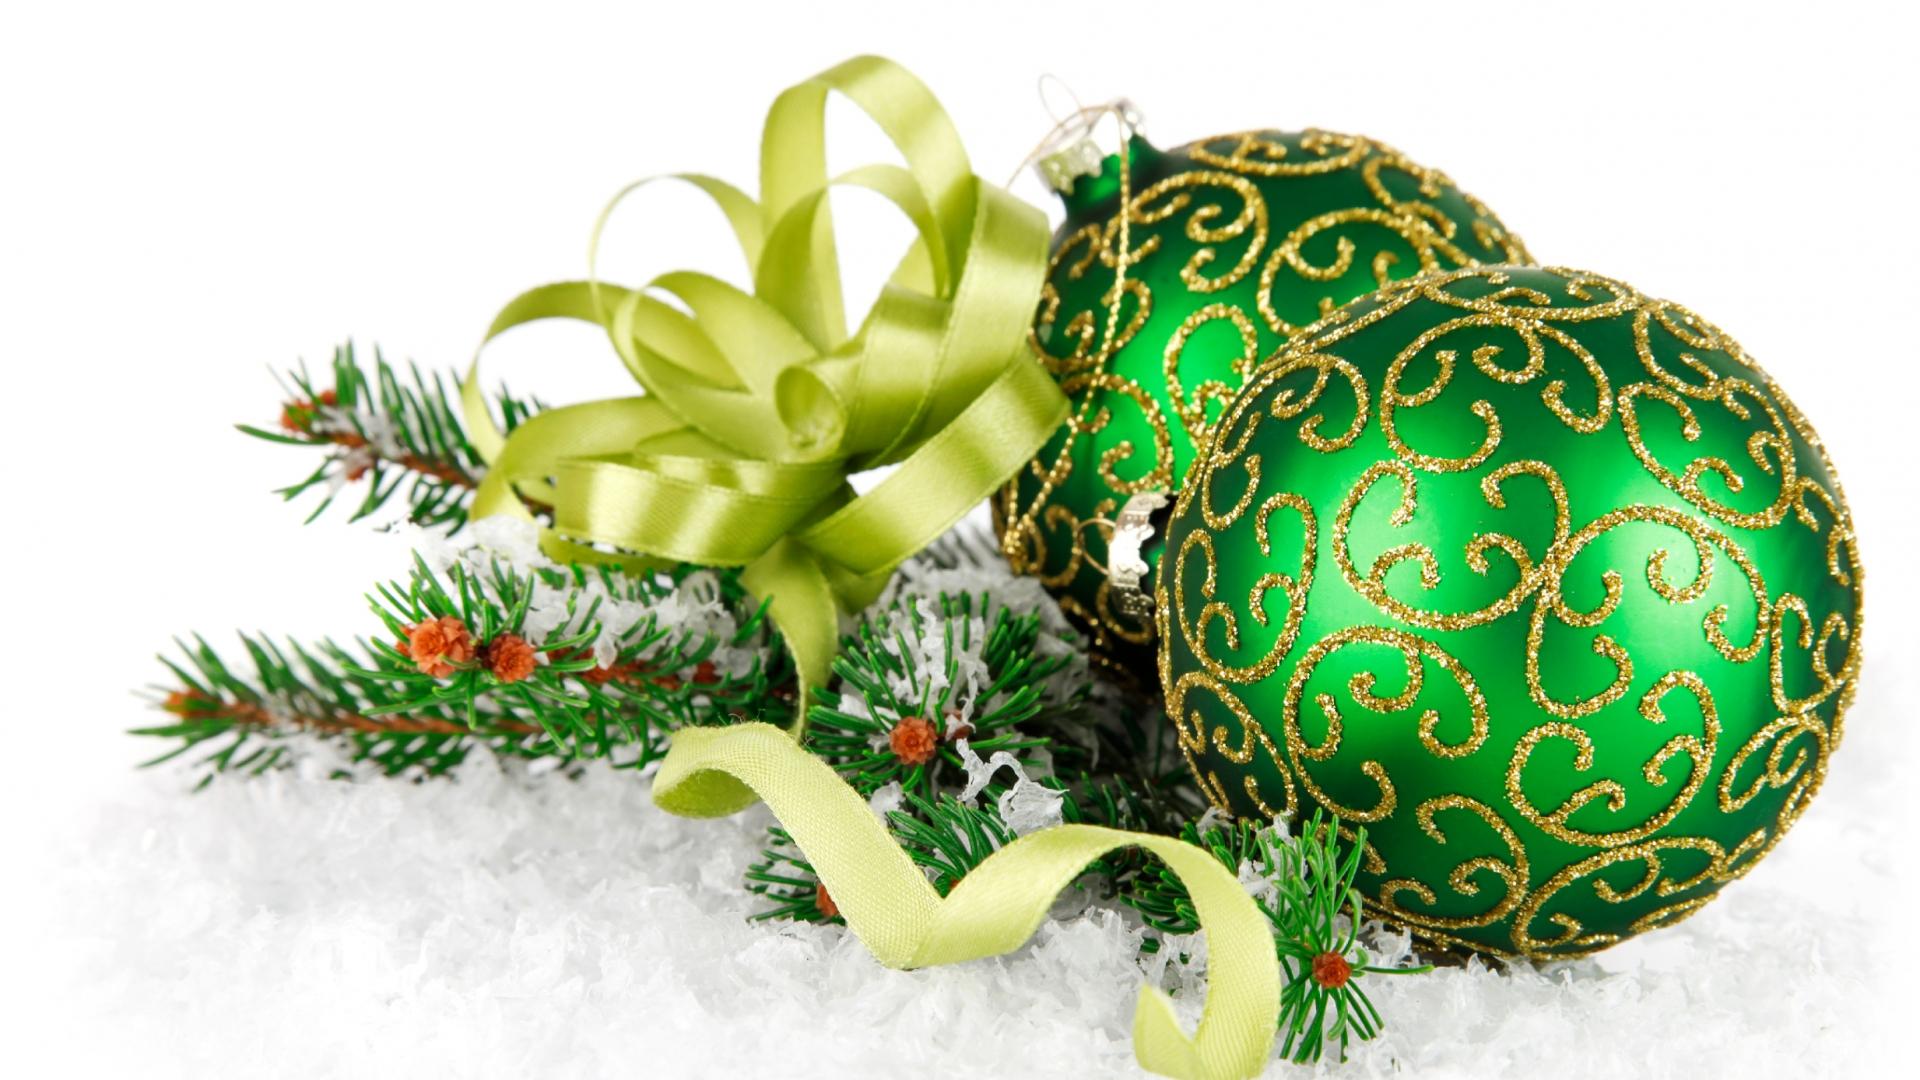 Bolitas verdes con escarcha 1920x1080 fondo de pantalla - Adornos de navidad online ...